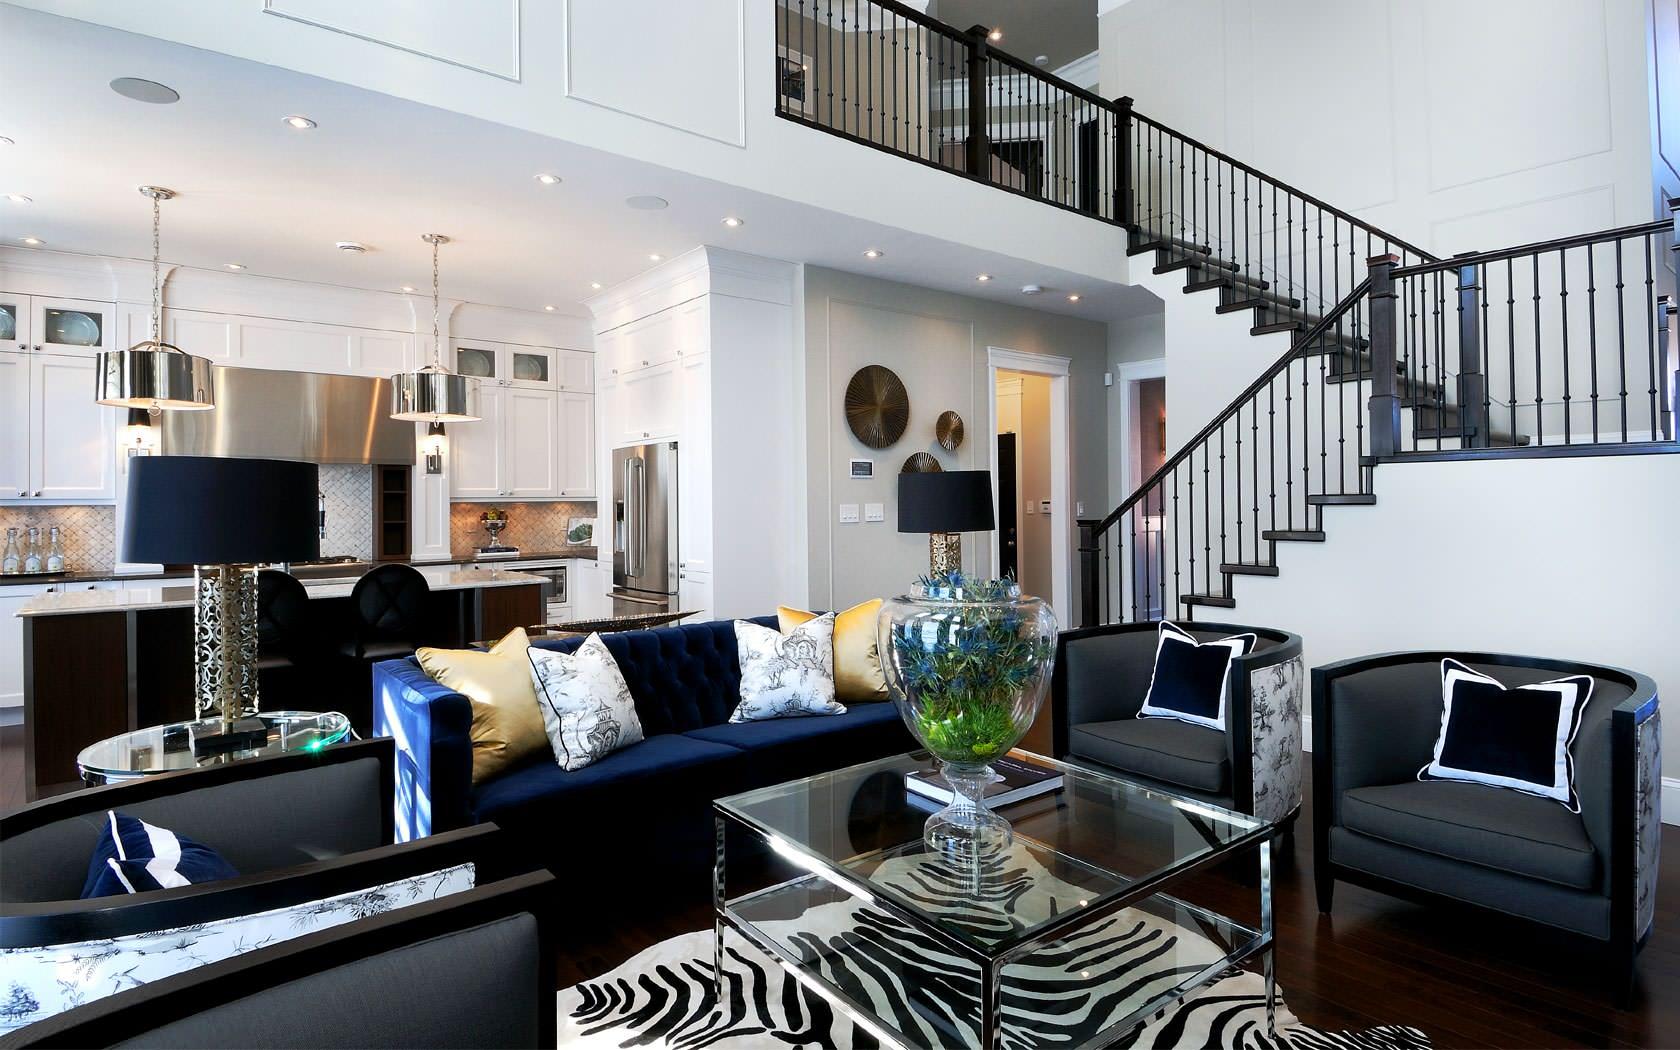 Luxury Homes Interior Pictures Houzz